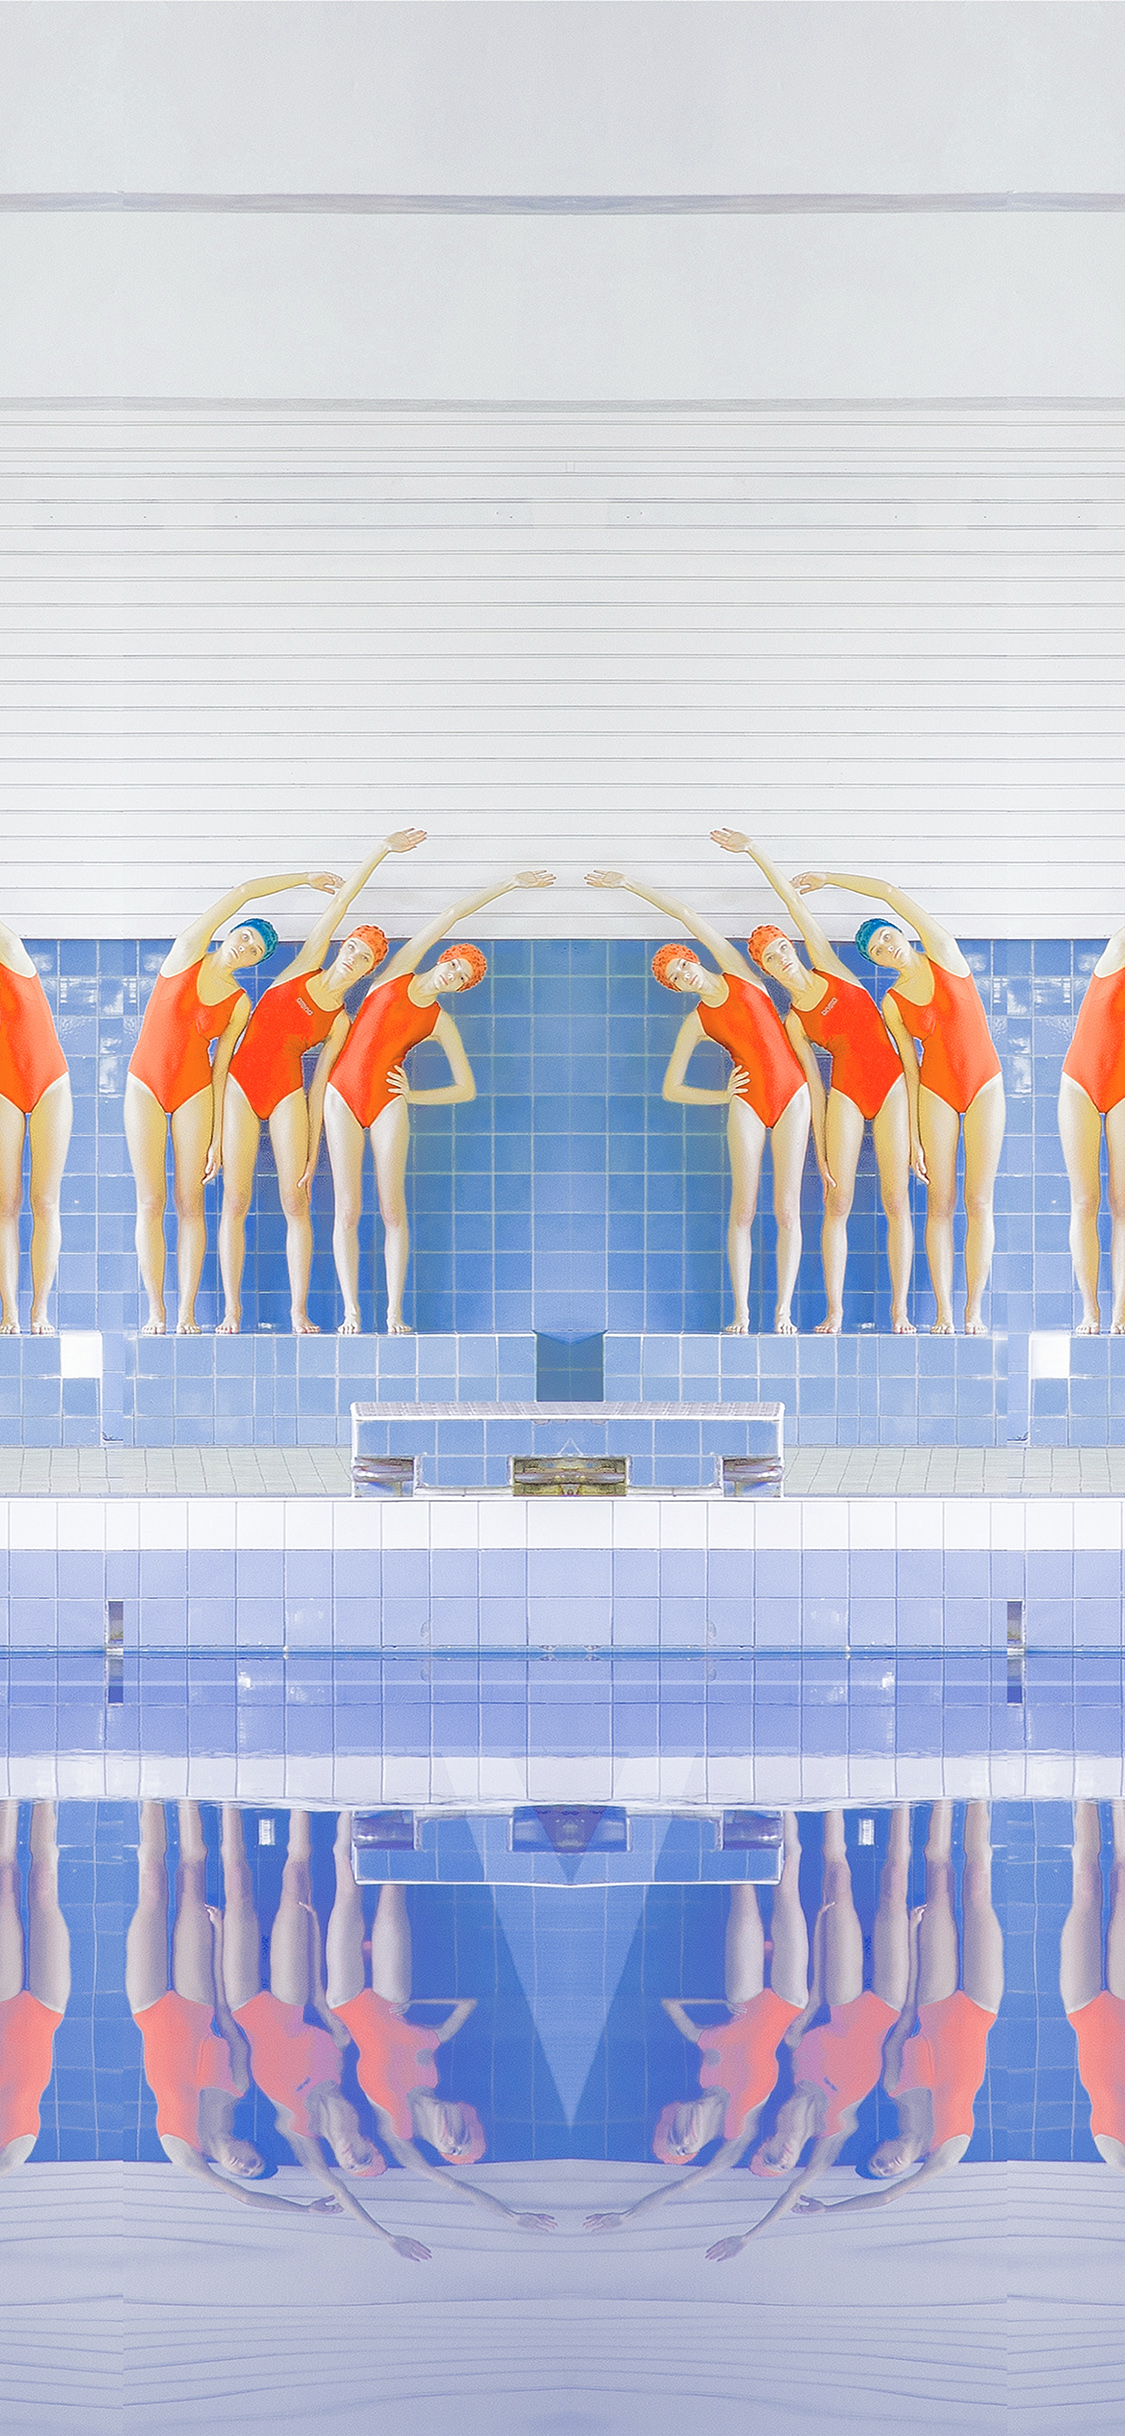 iPhonexpapers.com-Apple-iPhone-wallpaper-ba69-swim-girls-illustration-art-rainbow-color